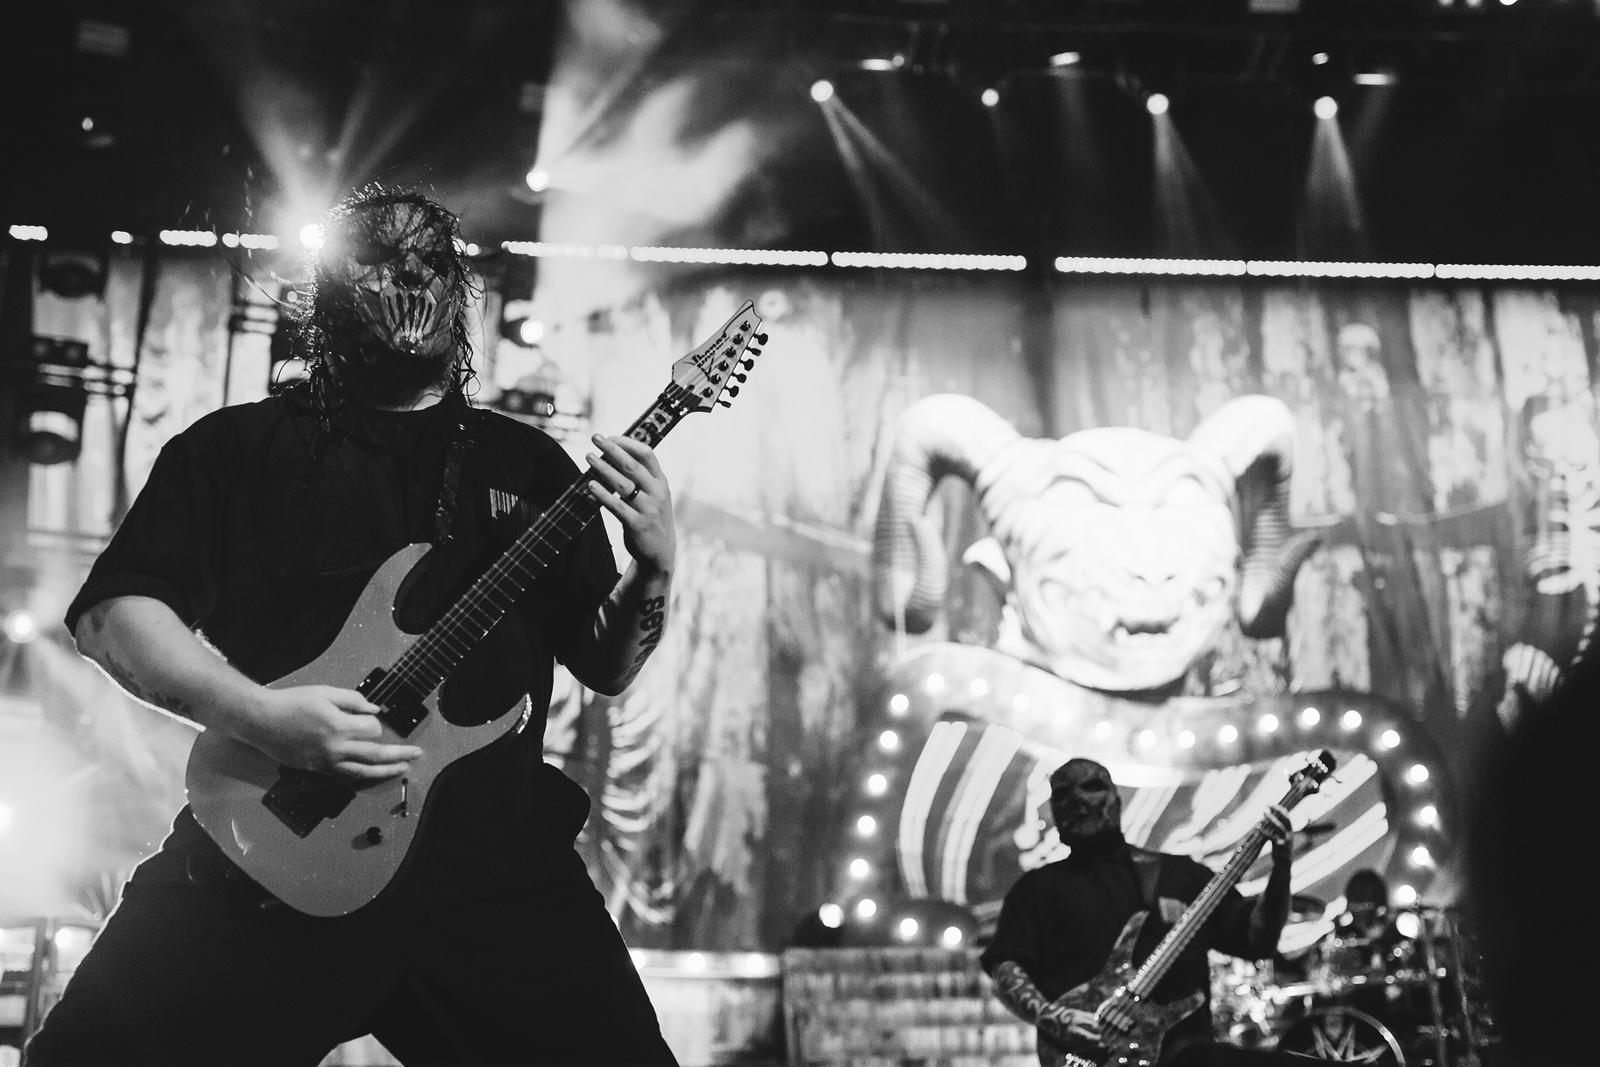 Mick Thomson of Slipknot by Adam Elmakias at Knofest 2015